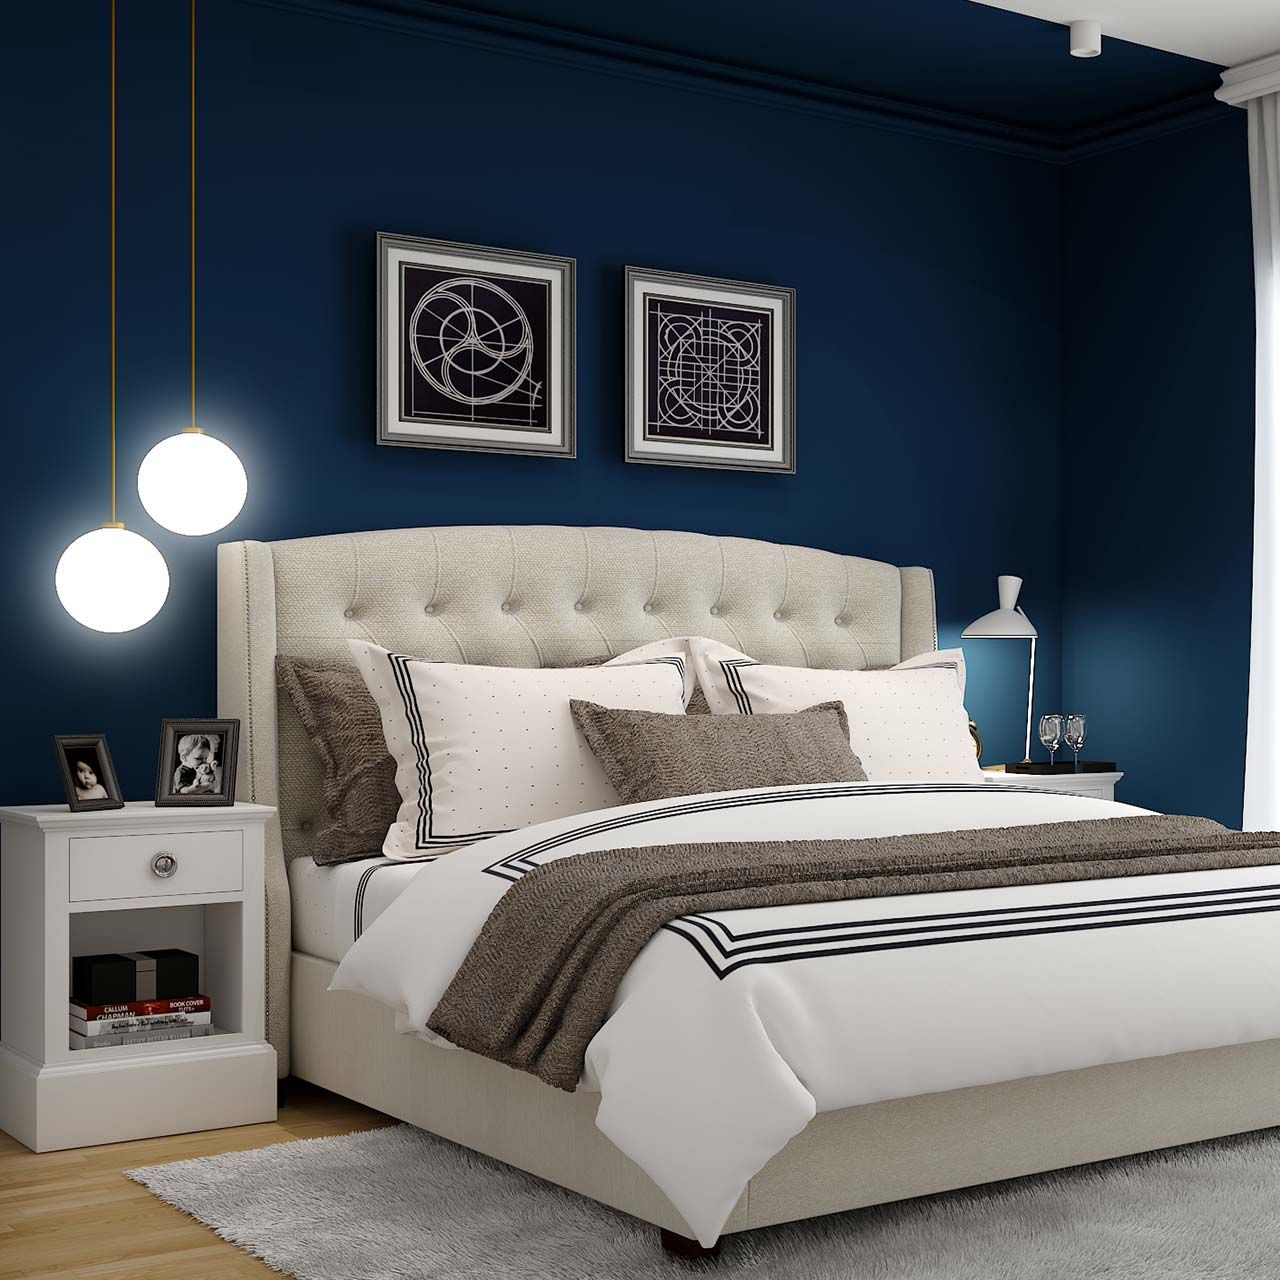 Latest Bedroom Wall Design and Decor Ideas Design Cafe Decor, Plant Decor,  Diy Home decor, Bedroom Decor, Living R… in 2020 | Bedroom wall designs,  Bedroom wall, Home decor